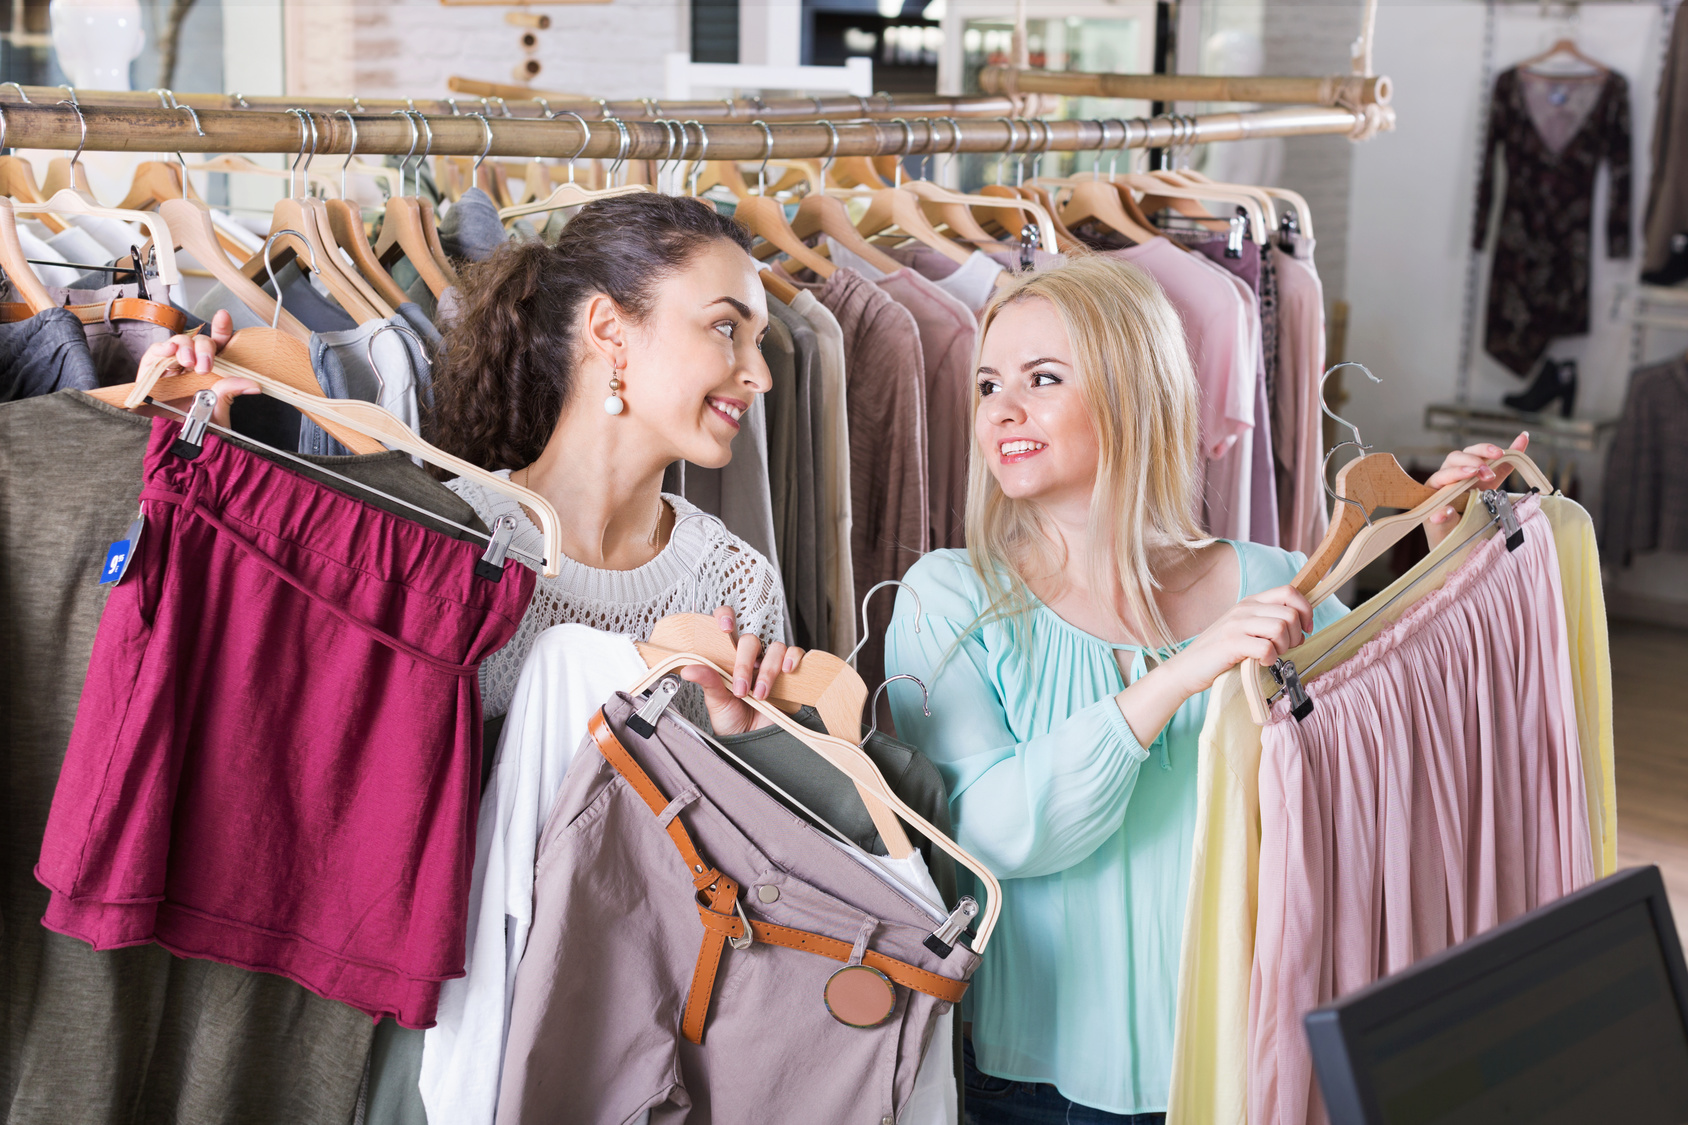 faire kleidung klamotten shoppen - lust und laster